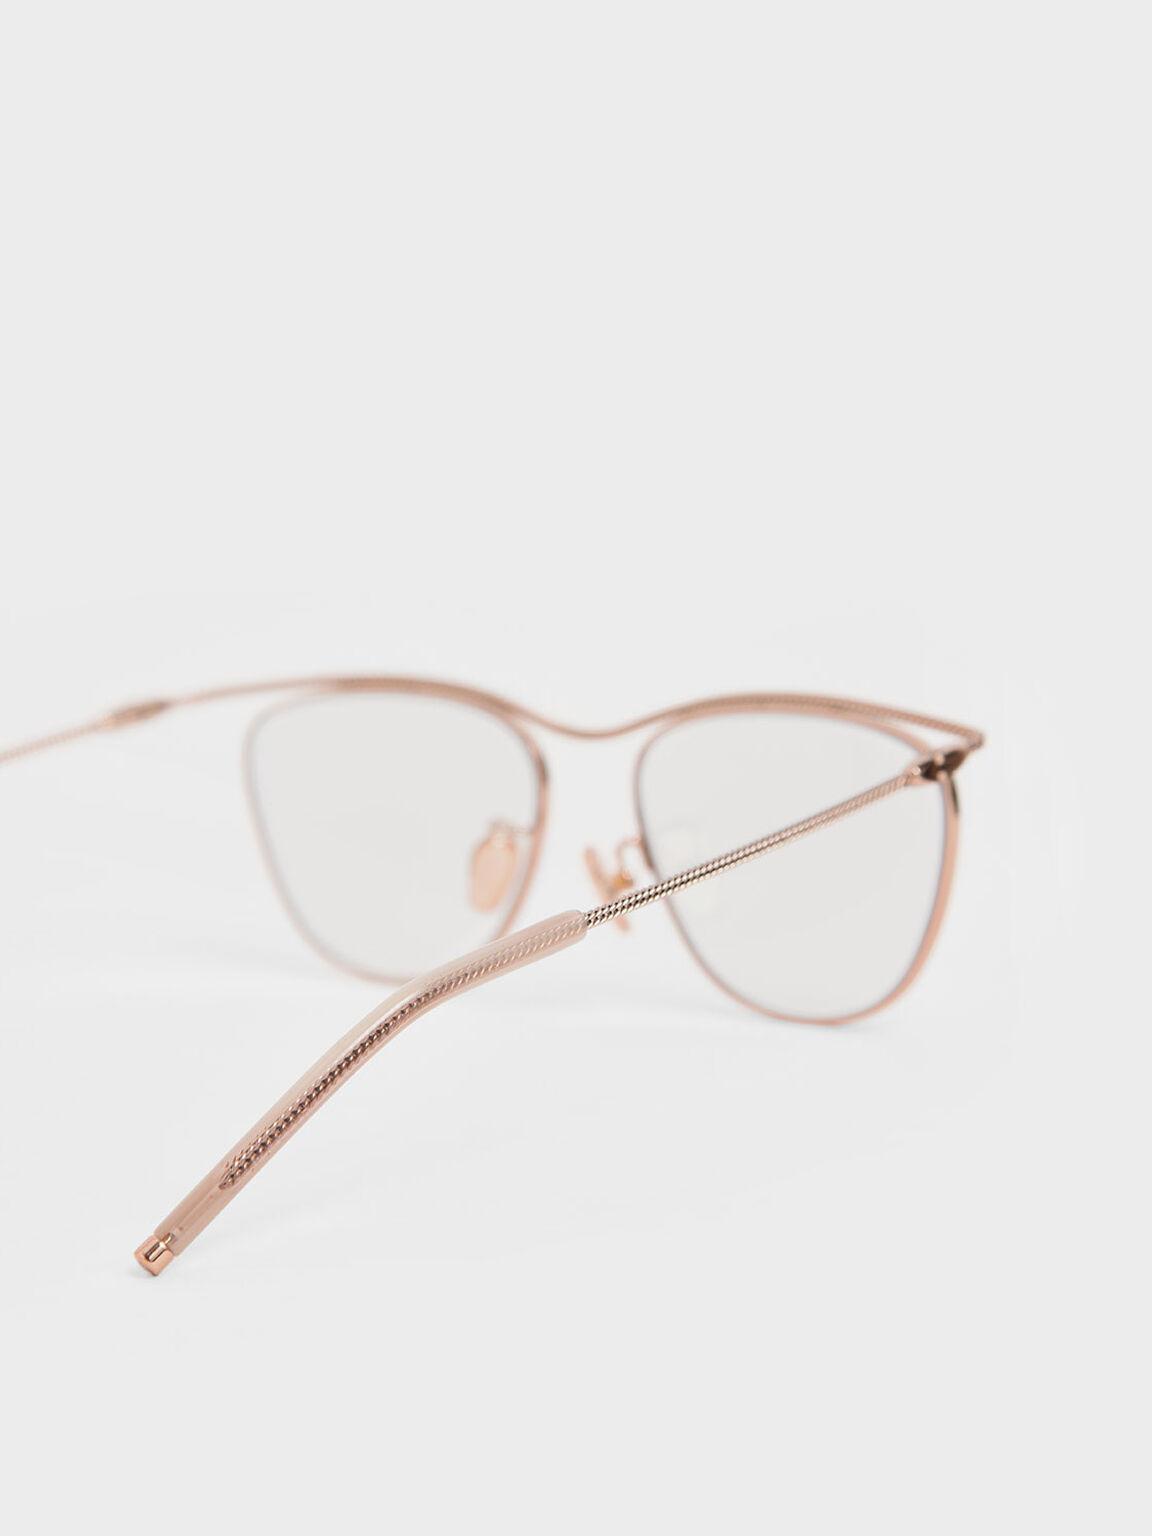 Wireframe Sunglasses, Rose Gold, hi-res